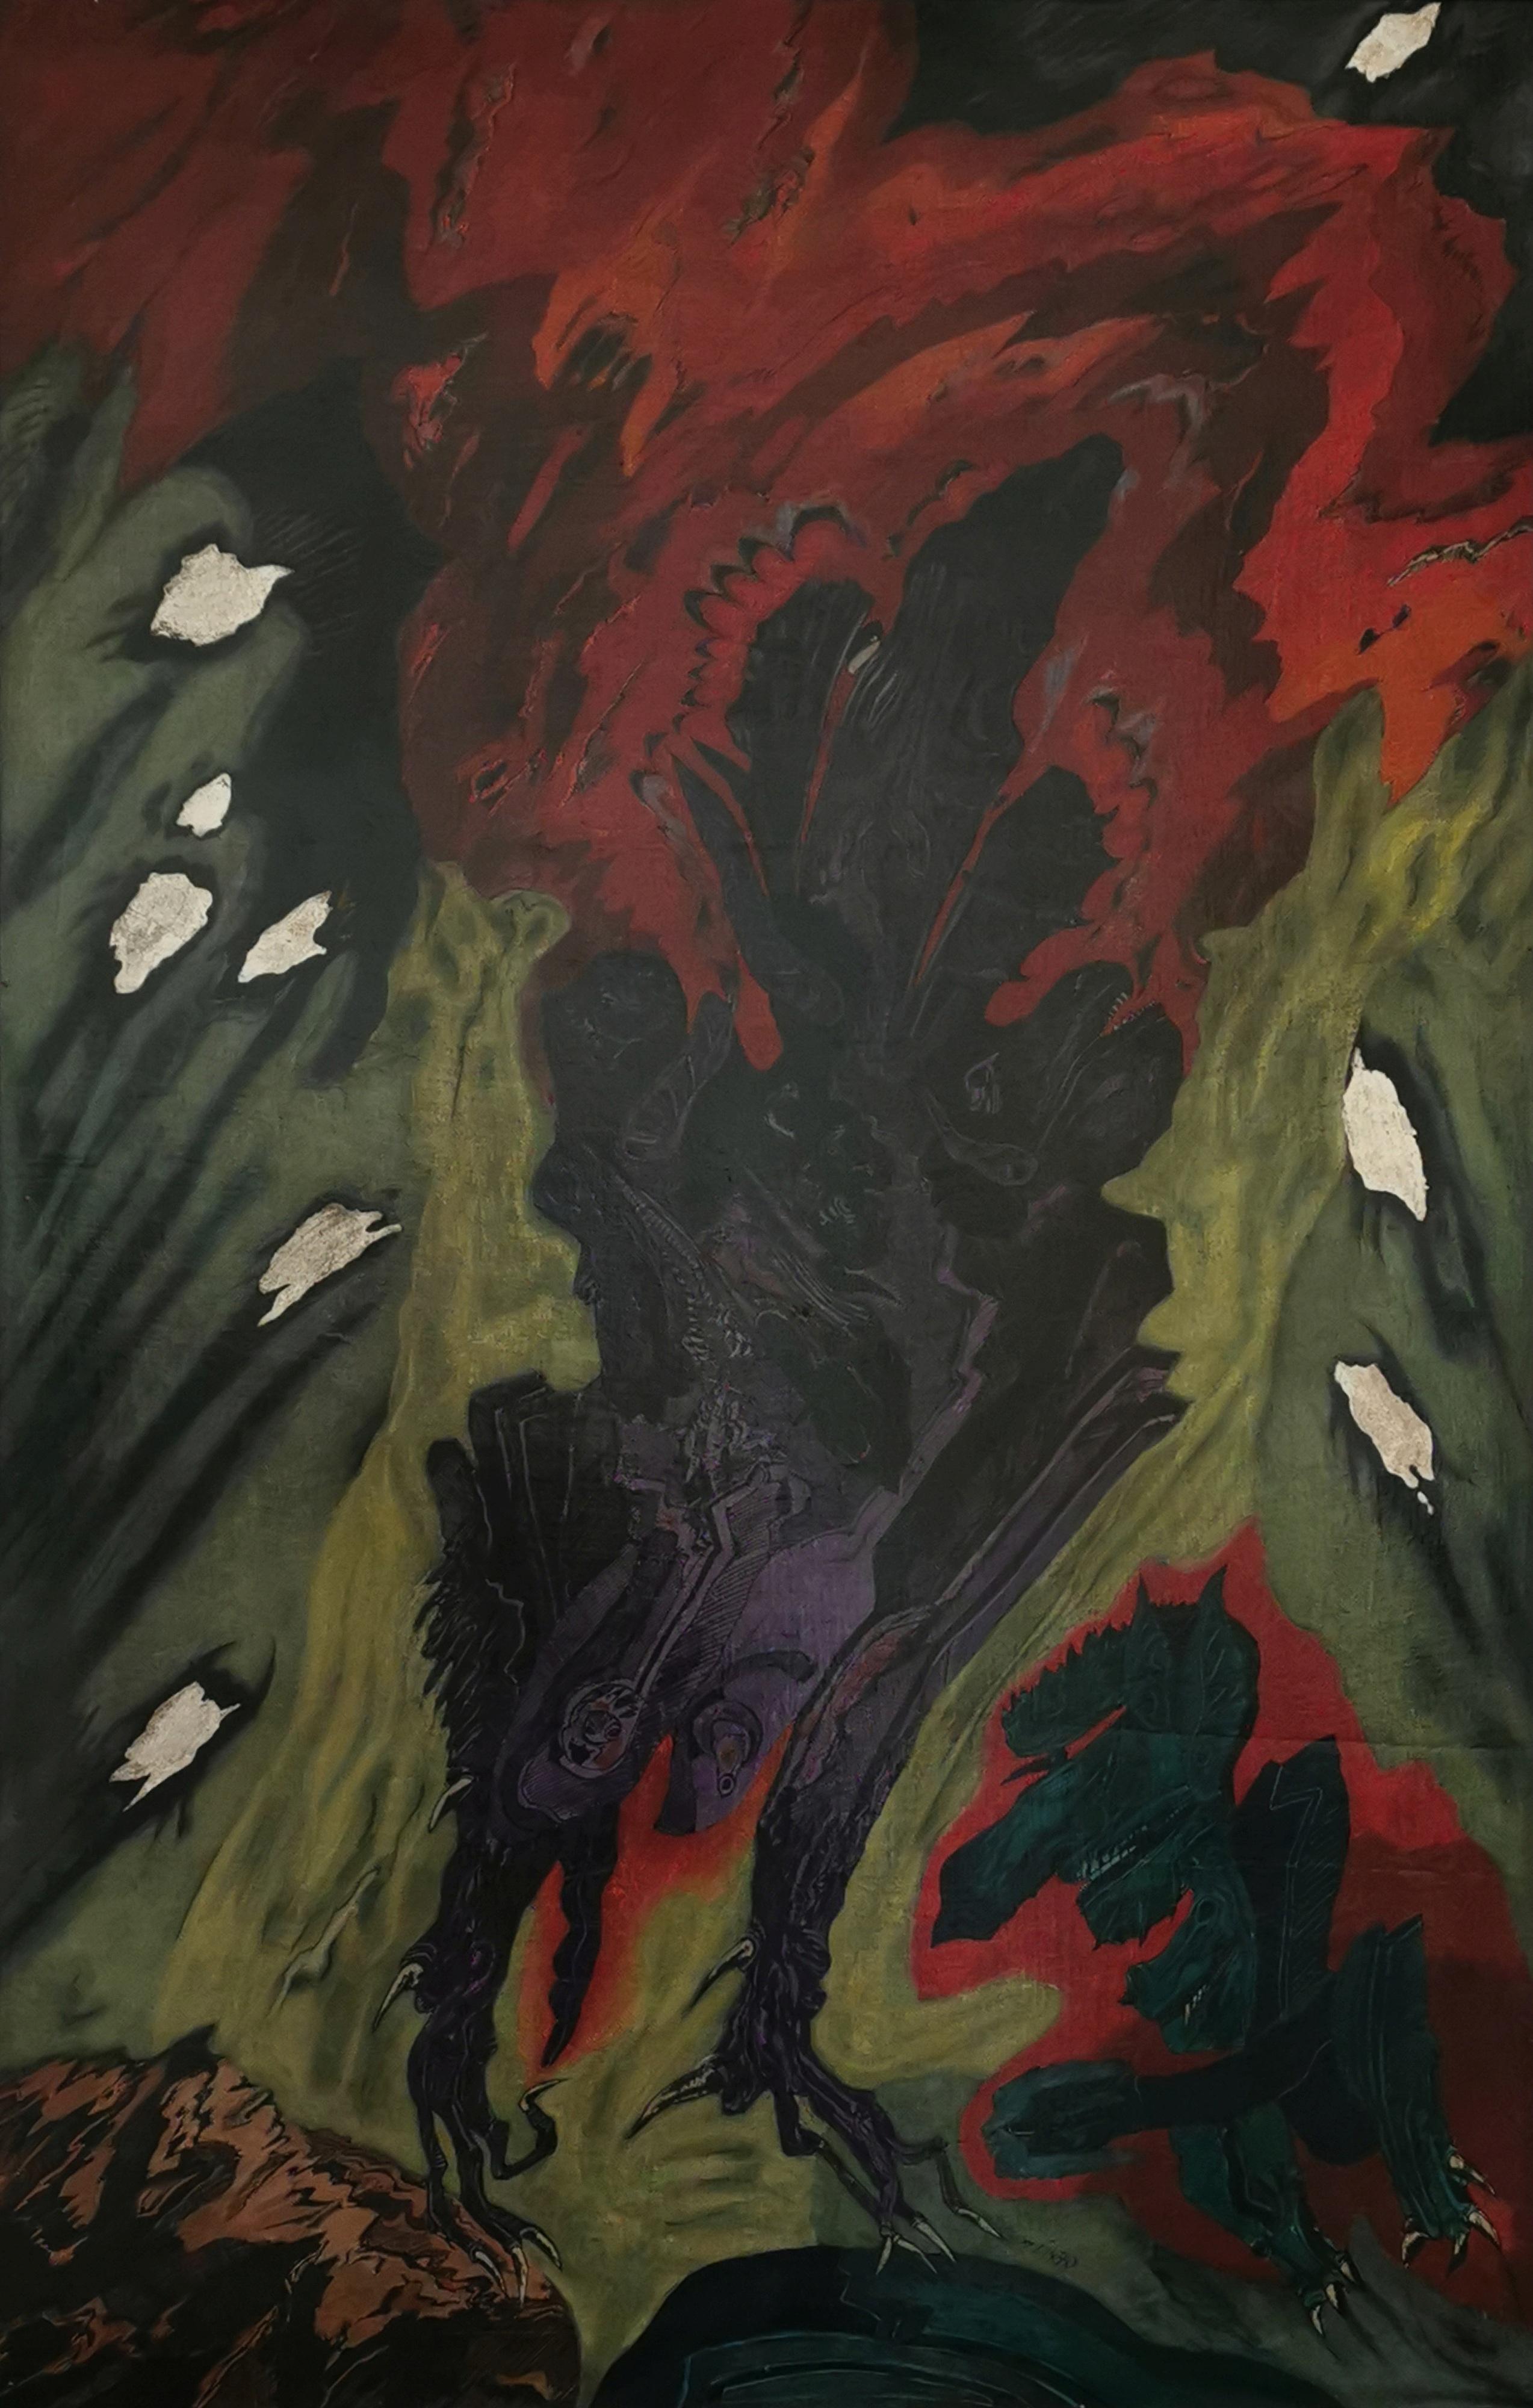 Spaloród, 1970